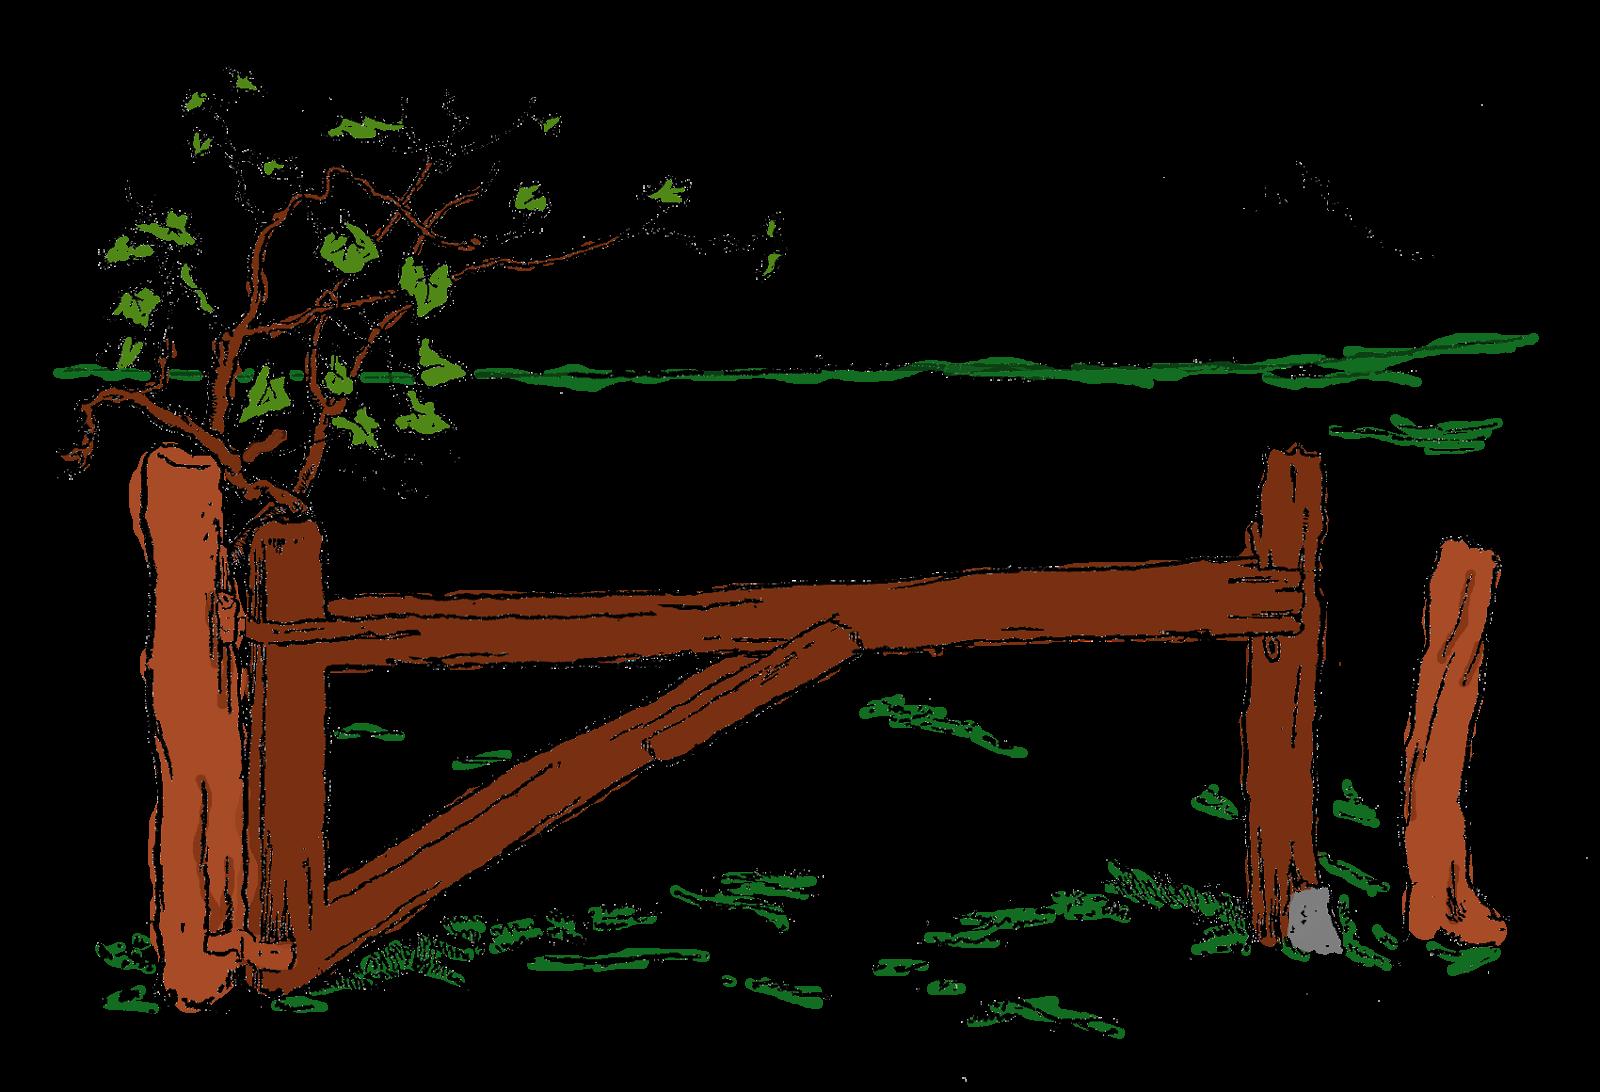 The graphics monarch digital. Fence clipart split rail fence